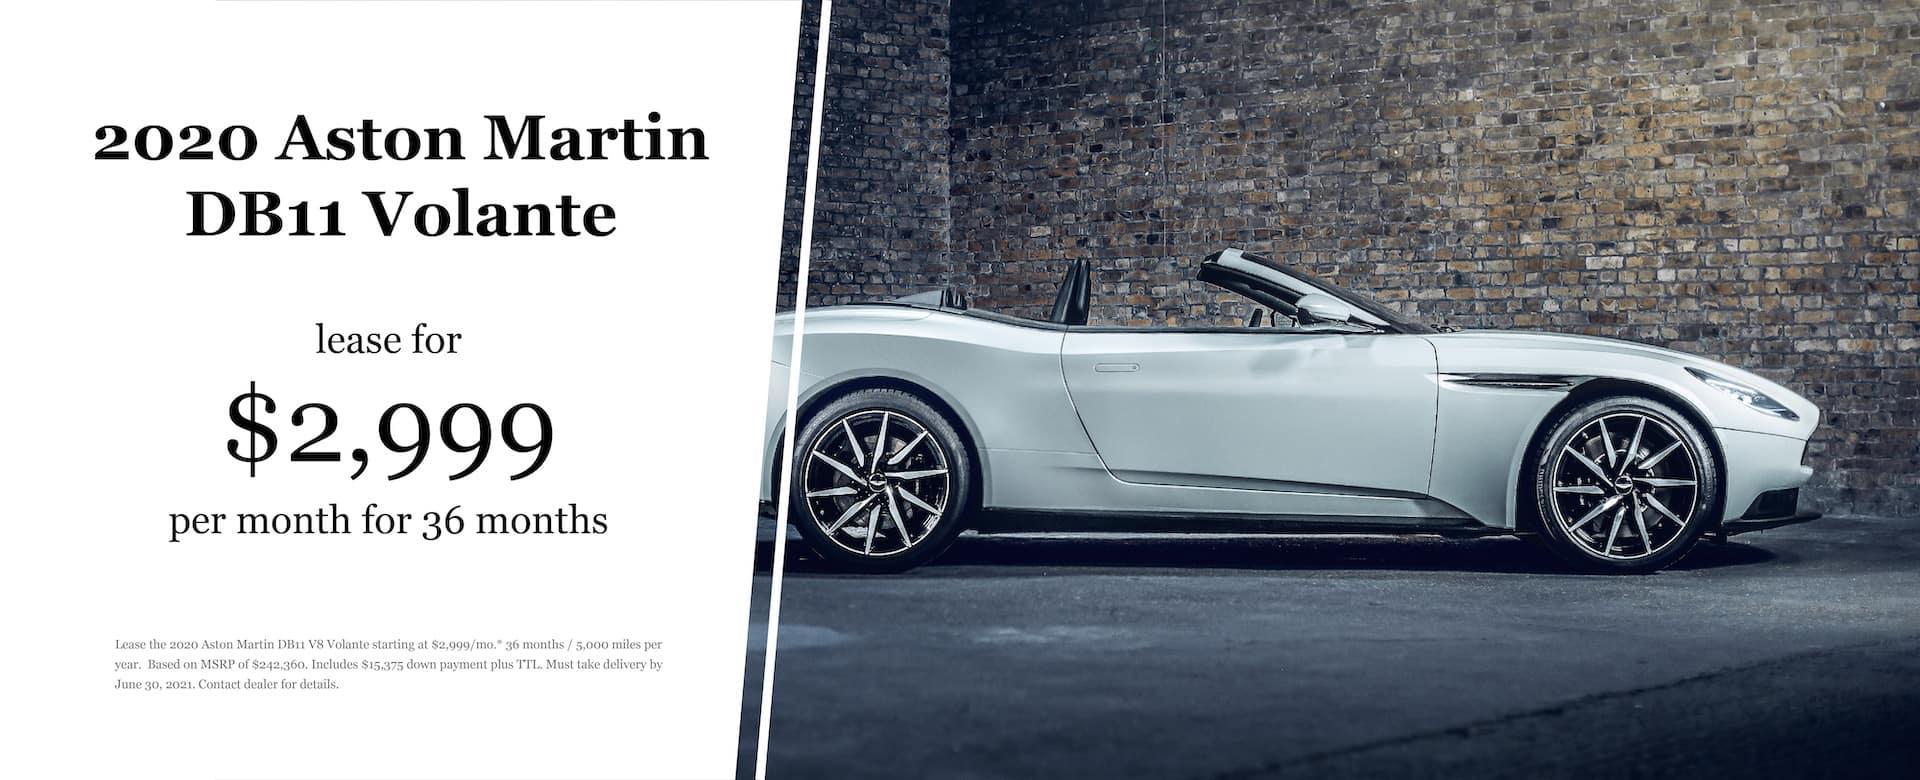 2020 Aston Martin DB11 Volante Lease